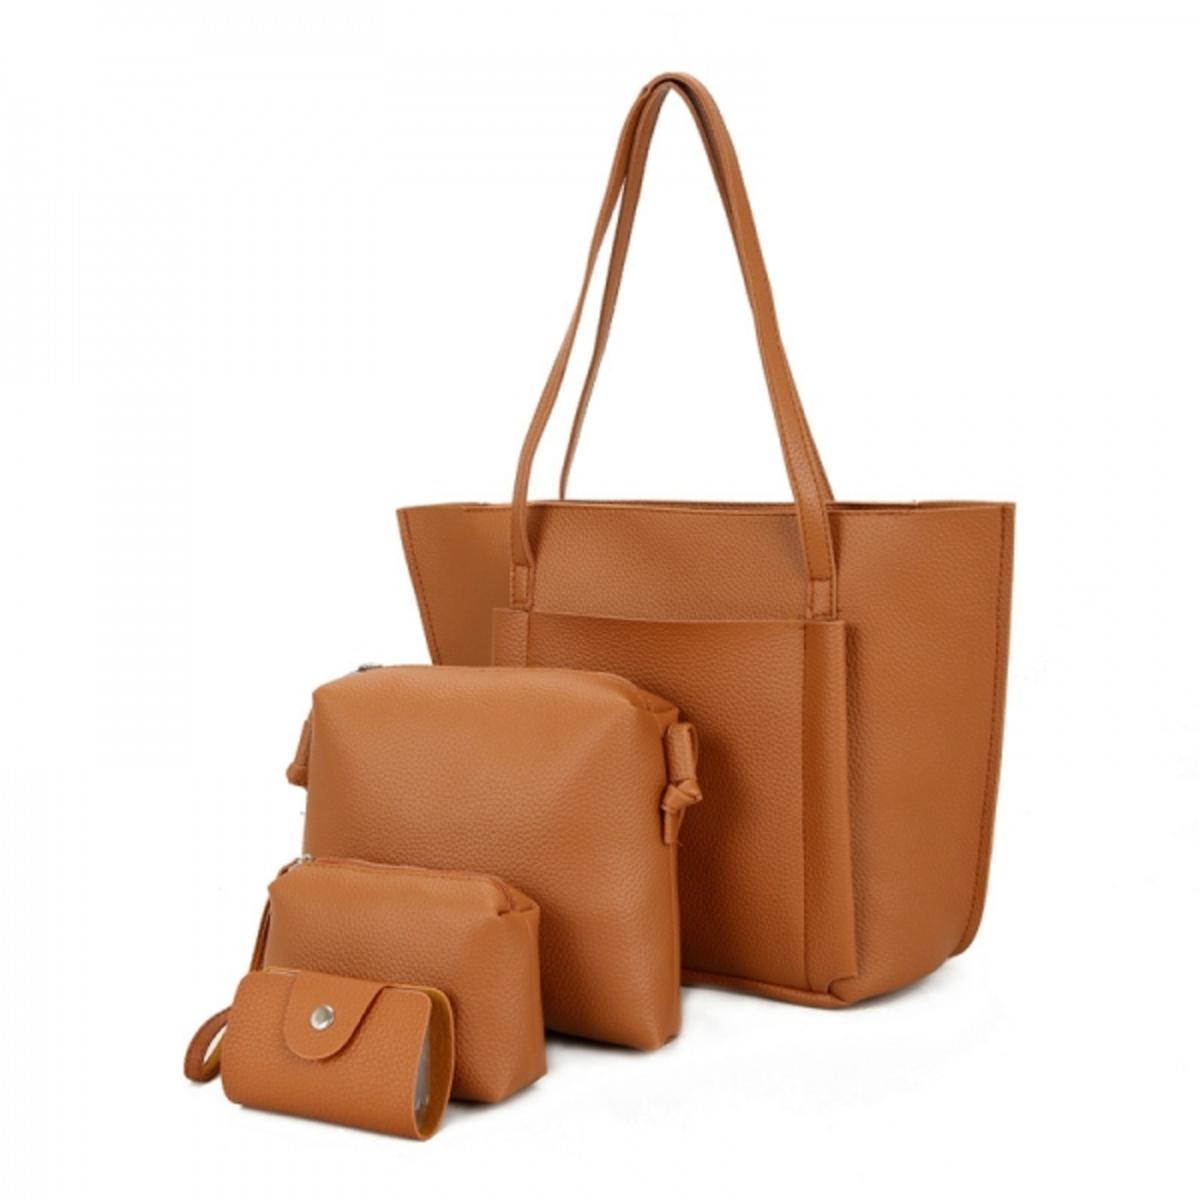 SoKaNo Trendz Premium Style Korean Style PU Leather Bag (Set of 4) - Brown   188cd18acd